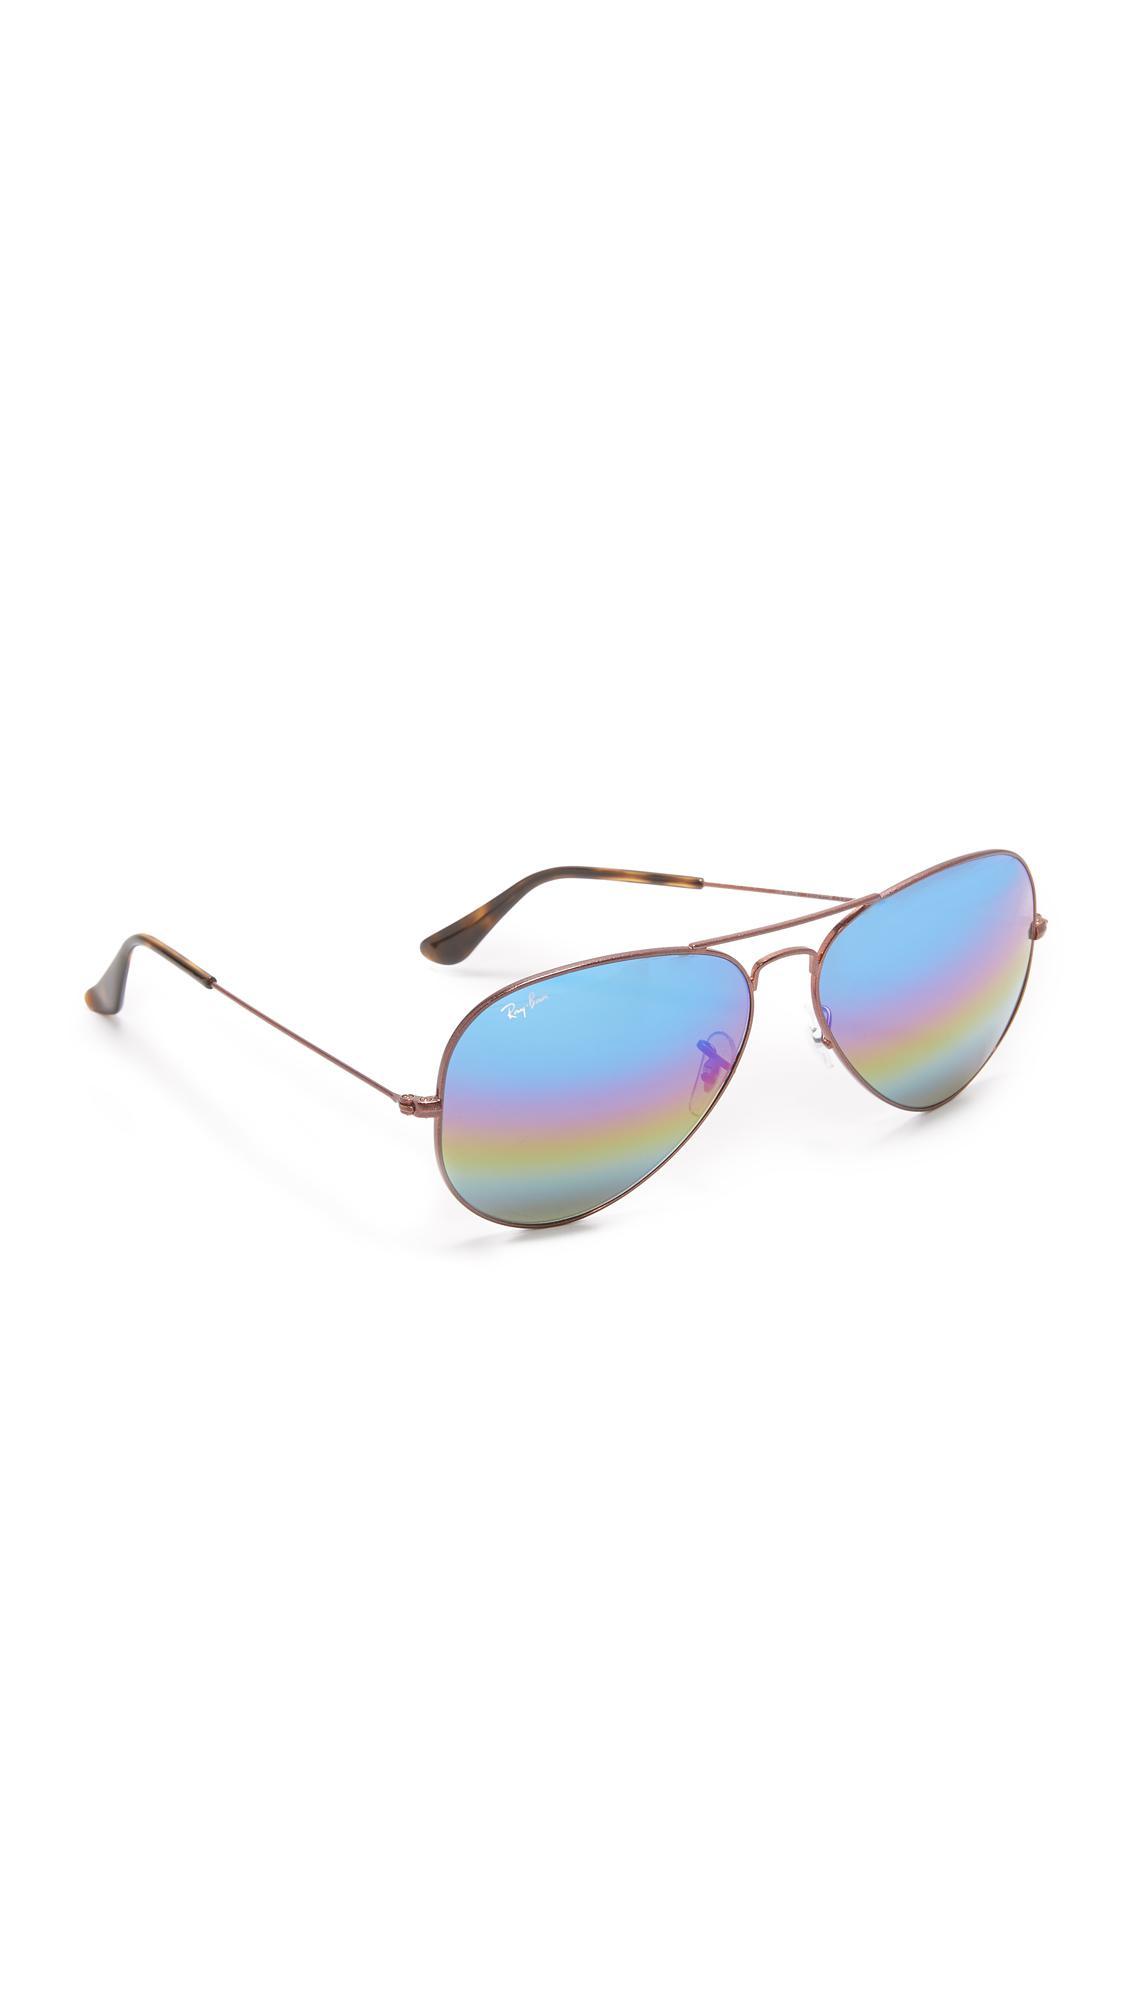 26a07463b9 ... promo code ray ban. womens blue rainbow mirrored aviator sunglasses  07ce7 28977